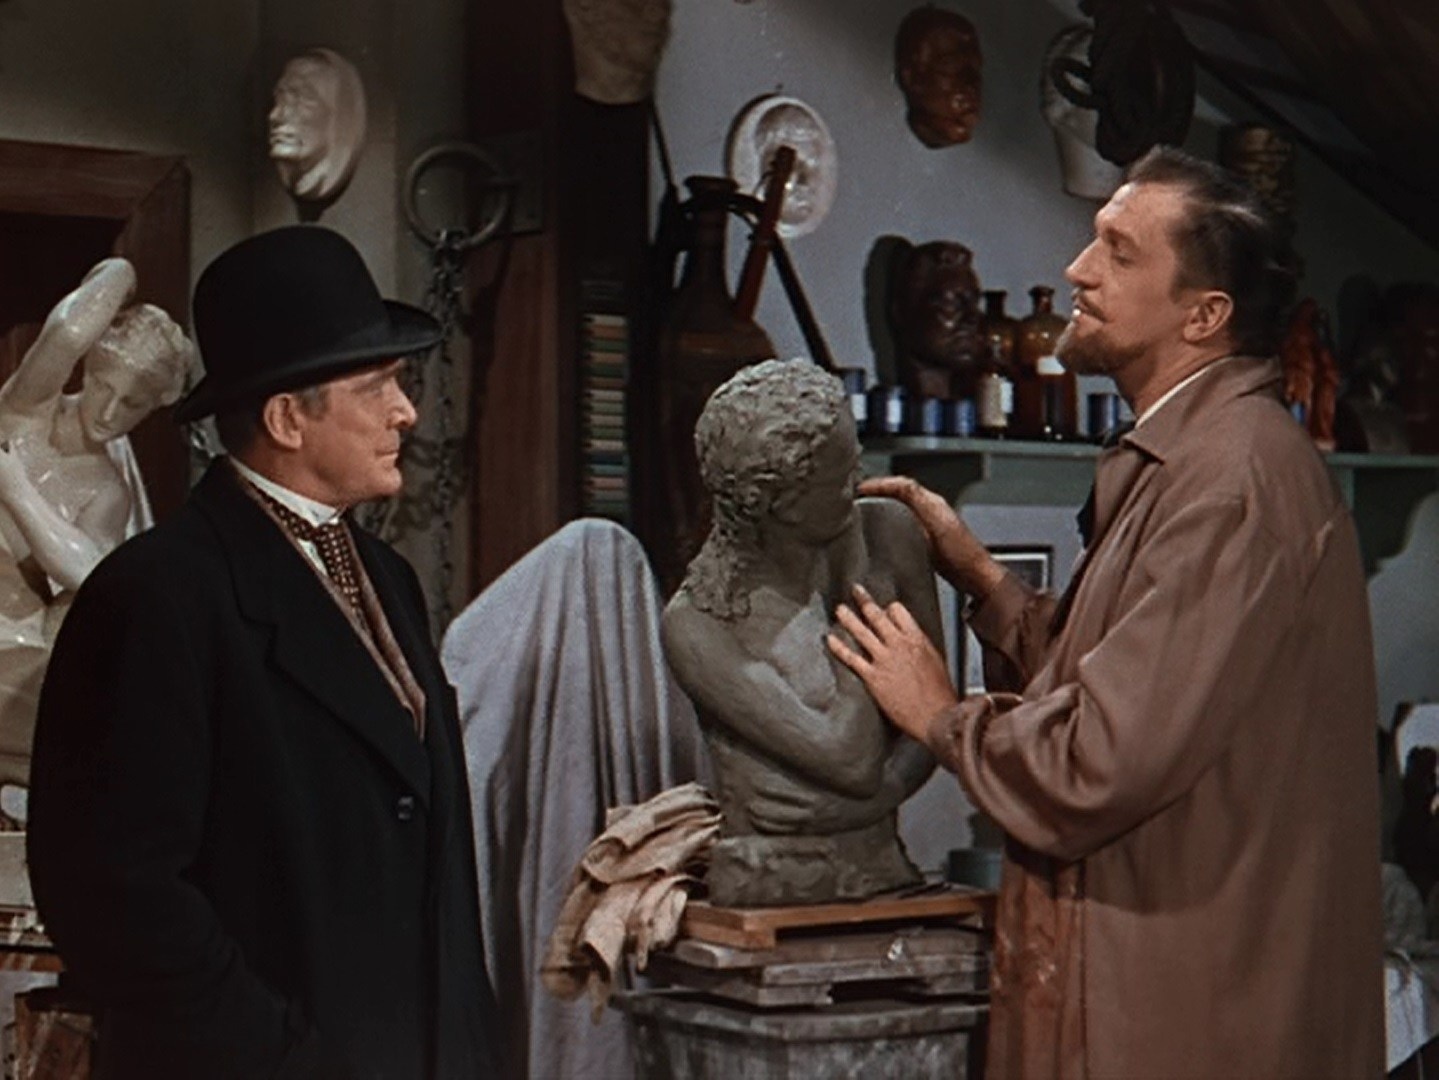 House-of-Wax-1953